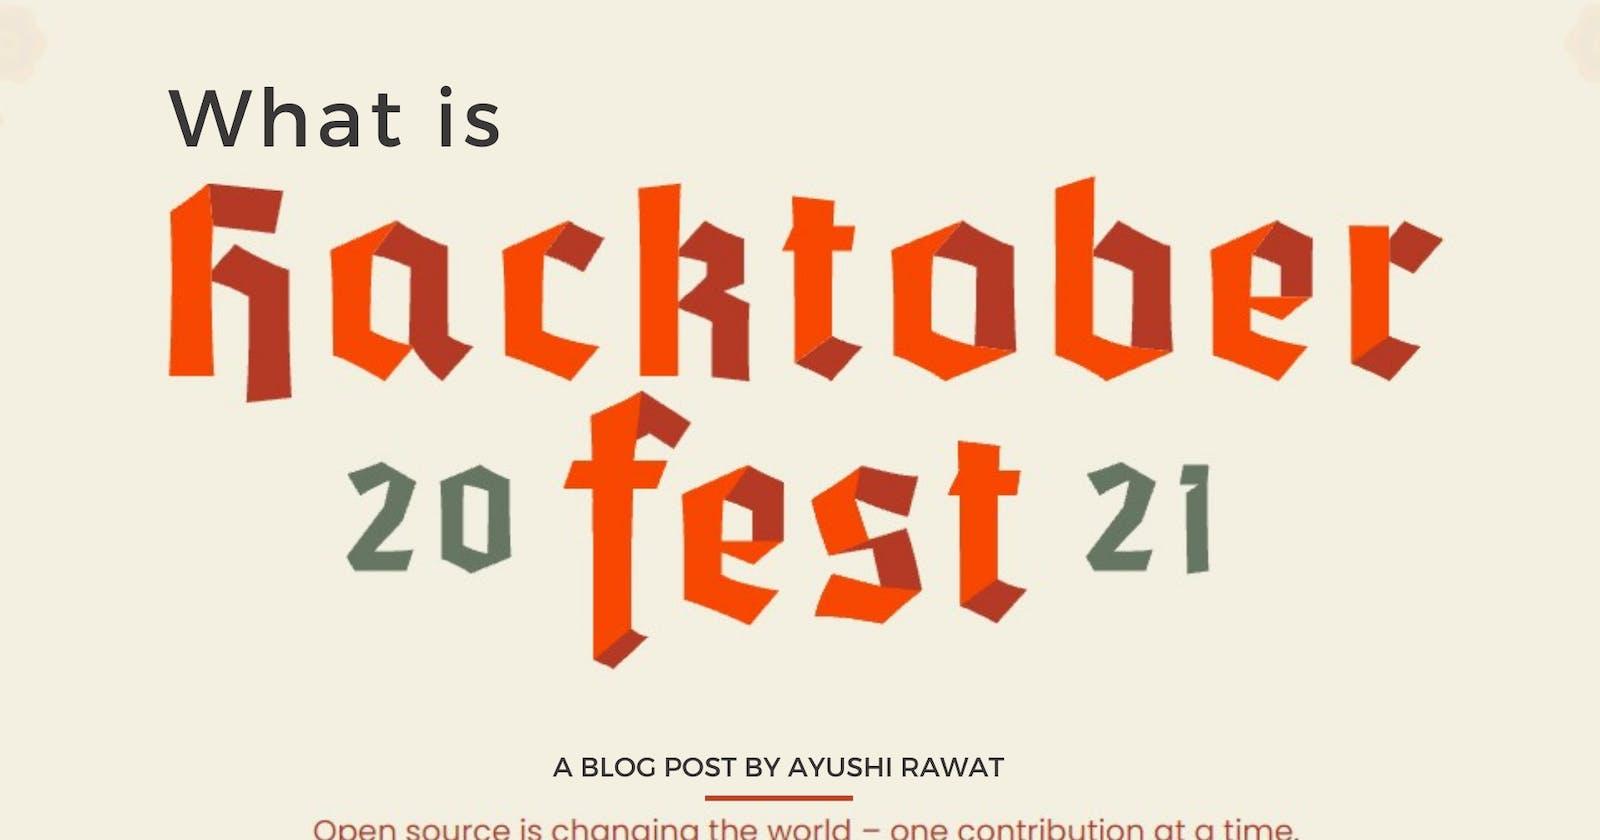 What is Hacktoberfest? Hacktoberfest 101